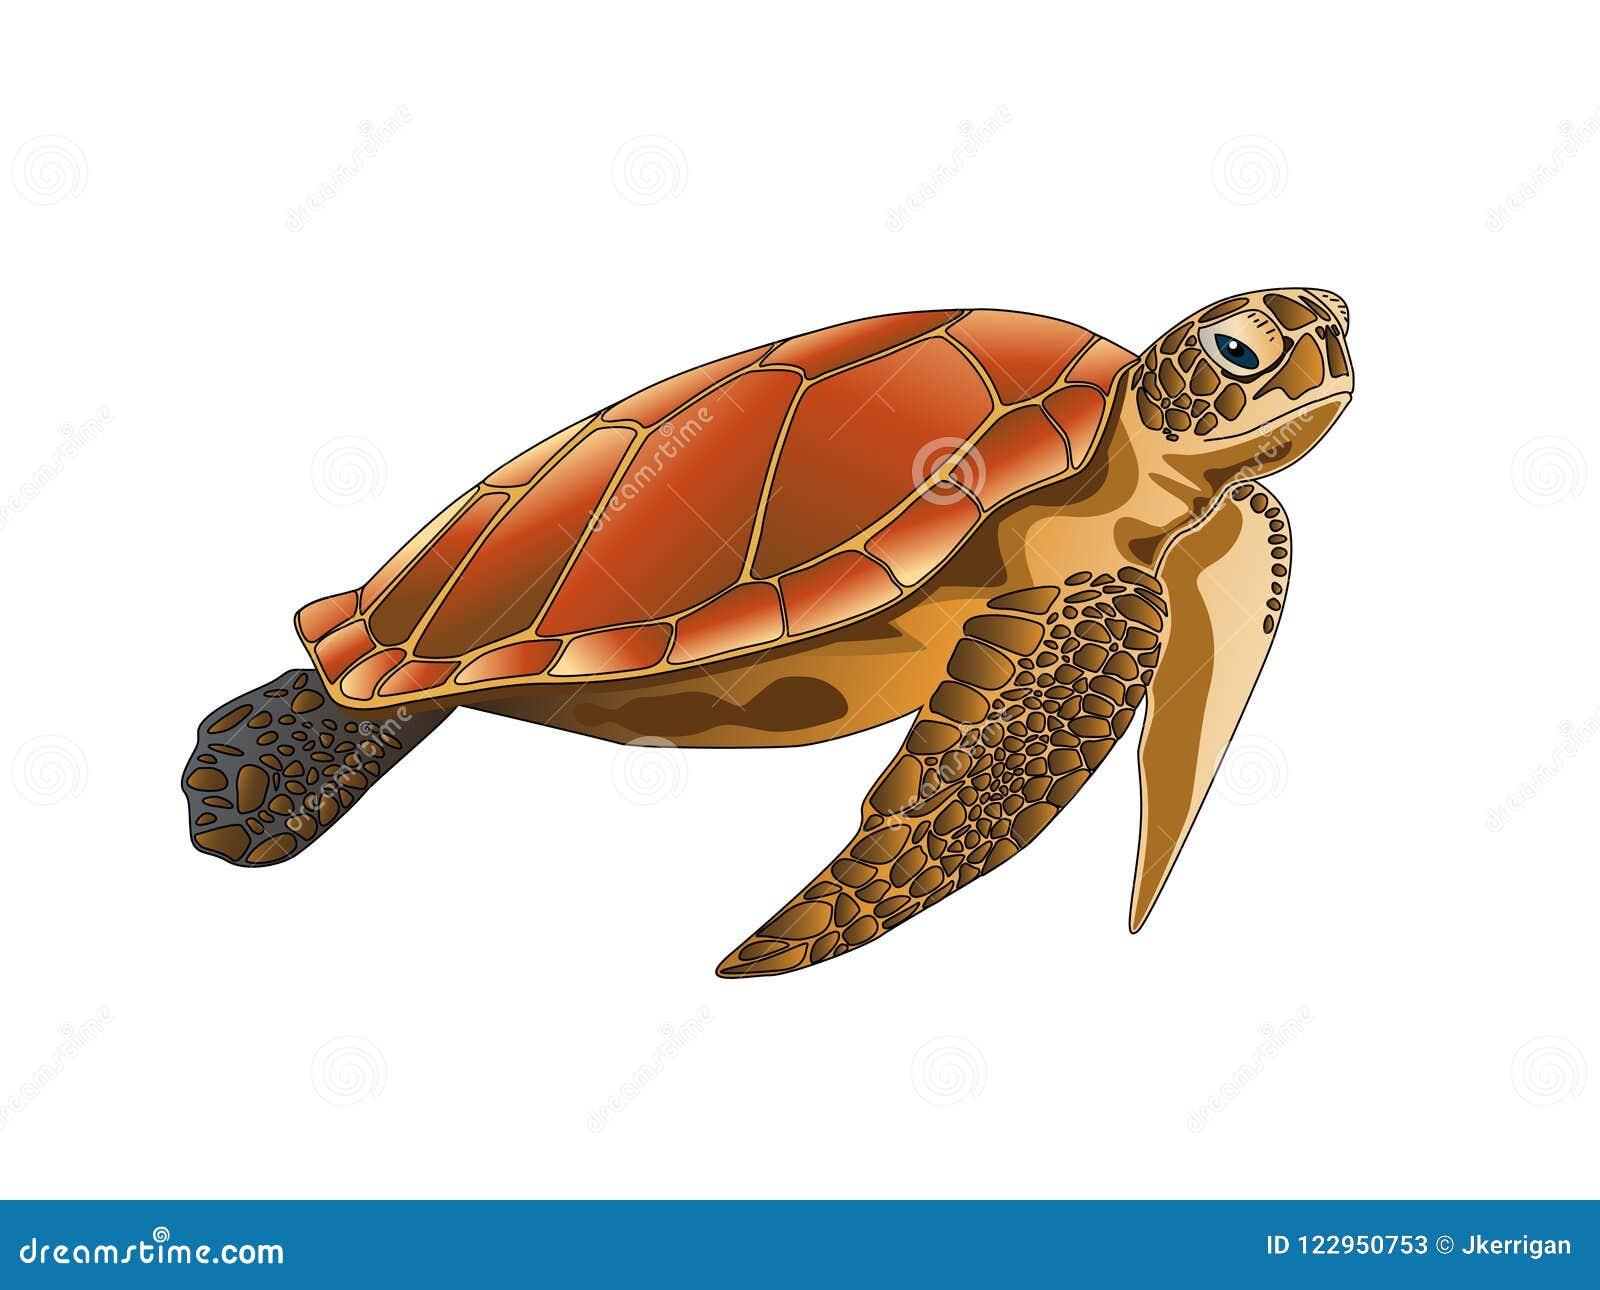 Isolated Sea Turtle on White Background